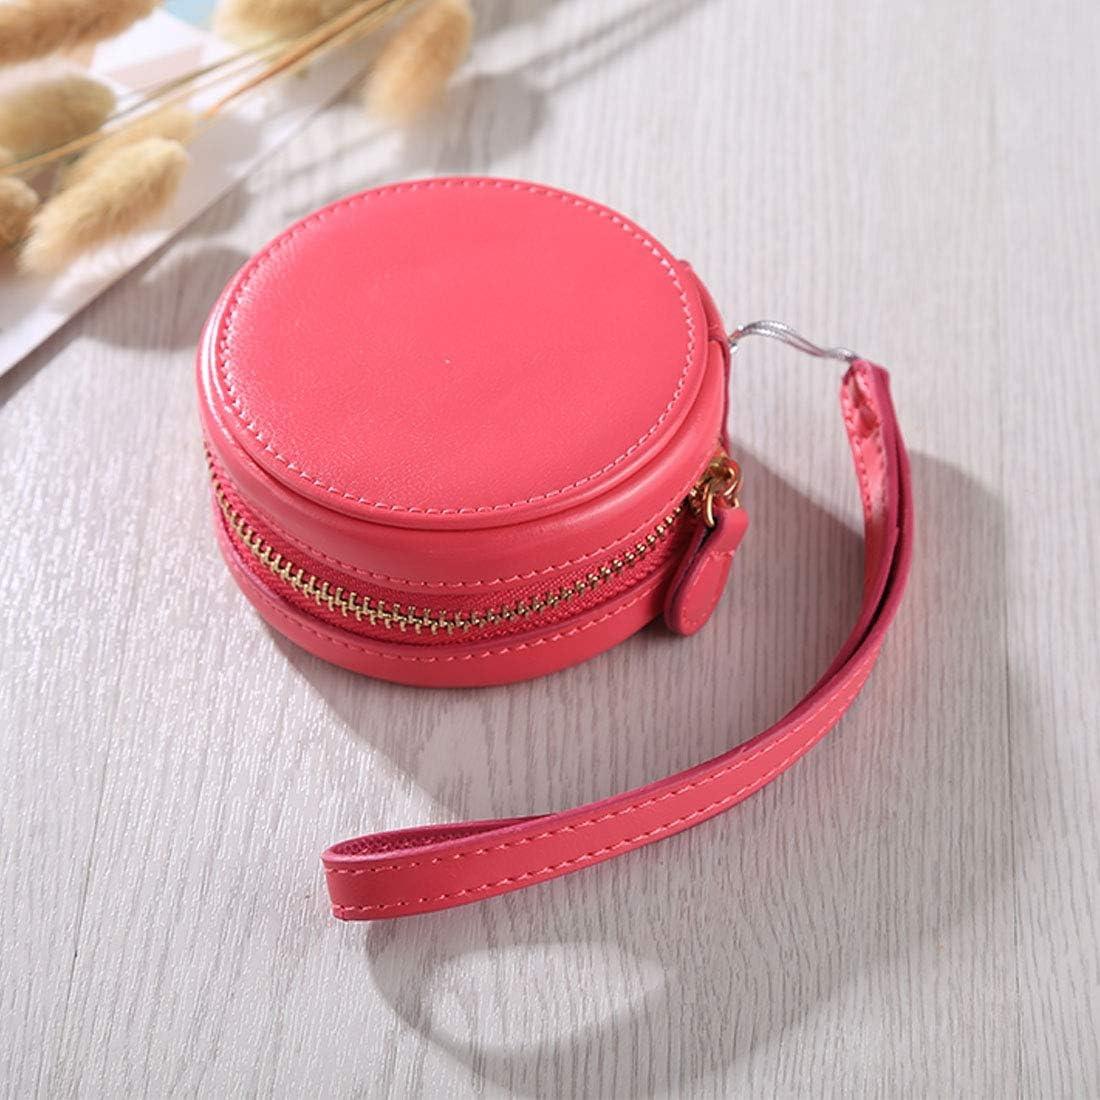 Color : Magenta MEETBM ZIMO,Full Body Camera Zipper PU Leather Case Bag with Hand Strap for Casio TR-M10 TRM Mini Black